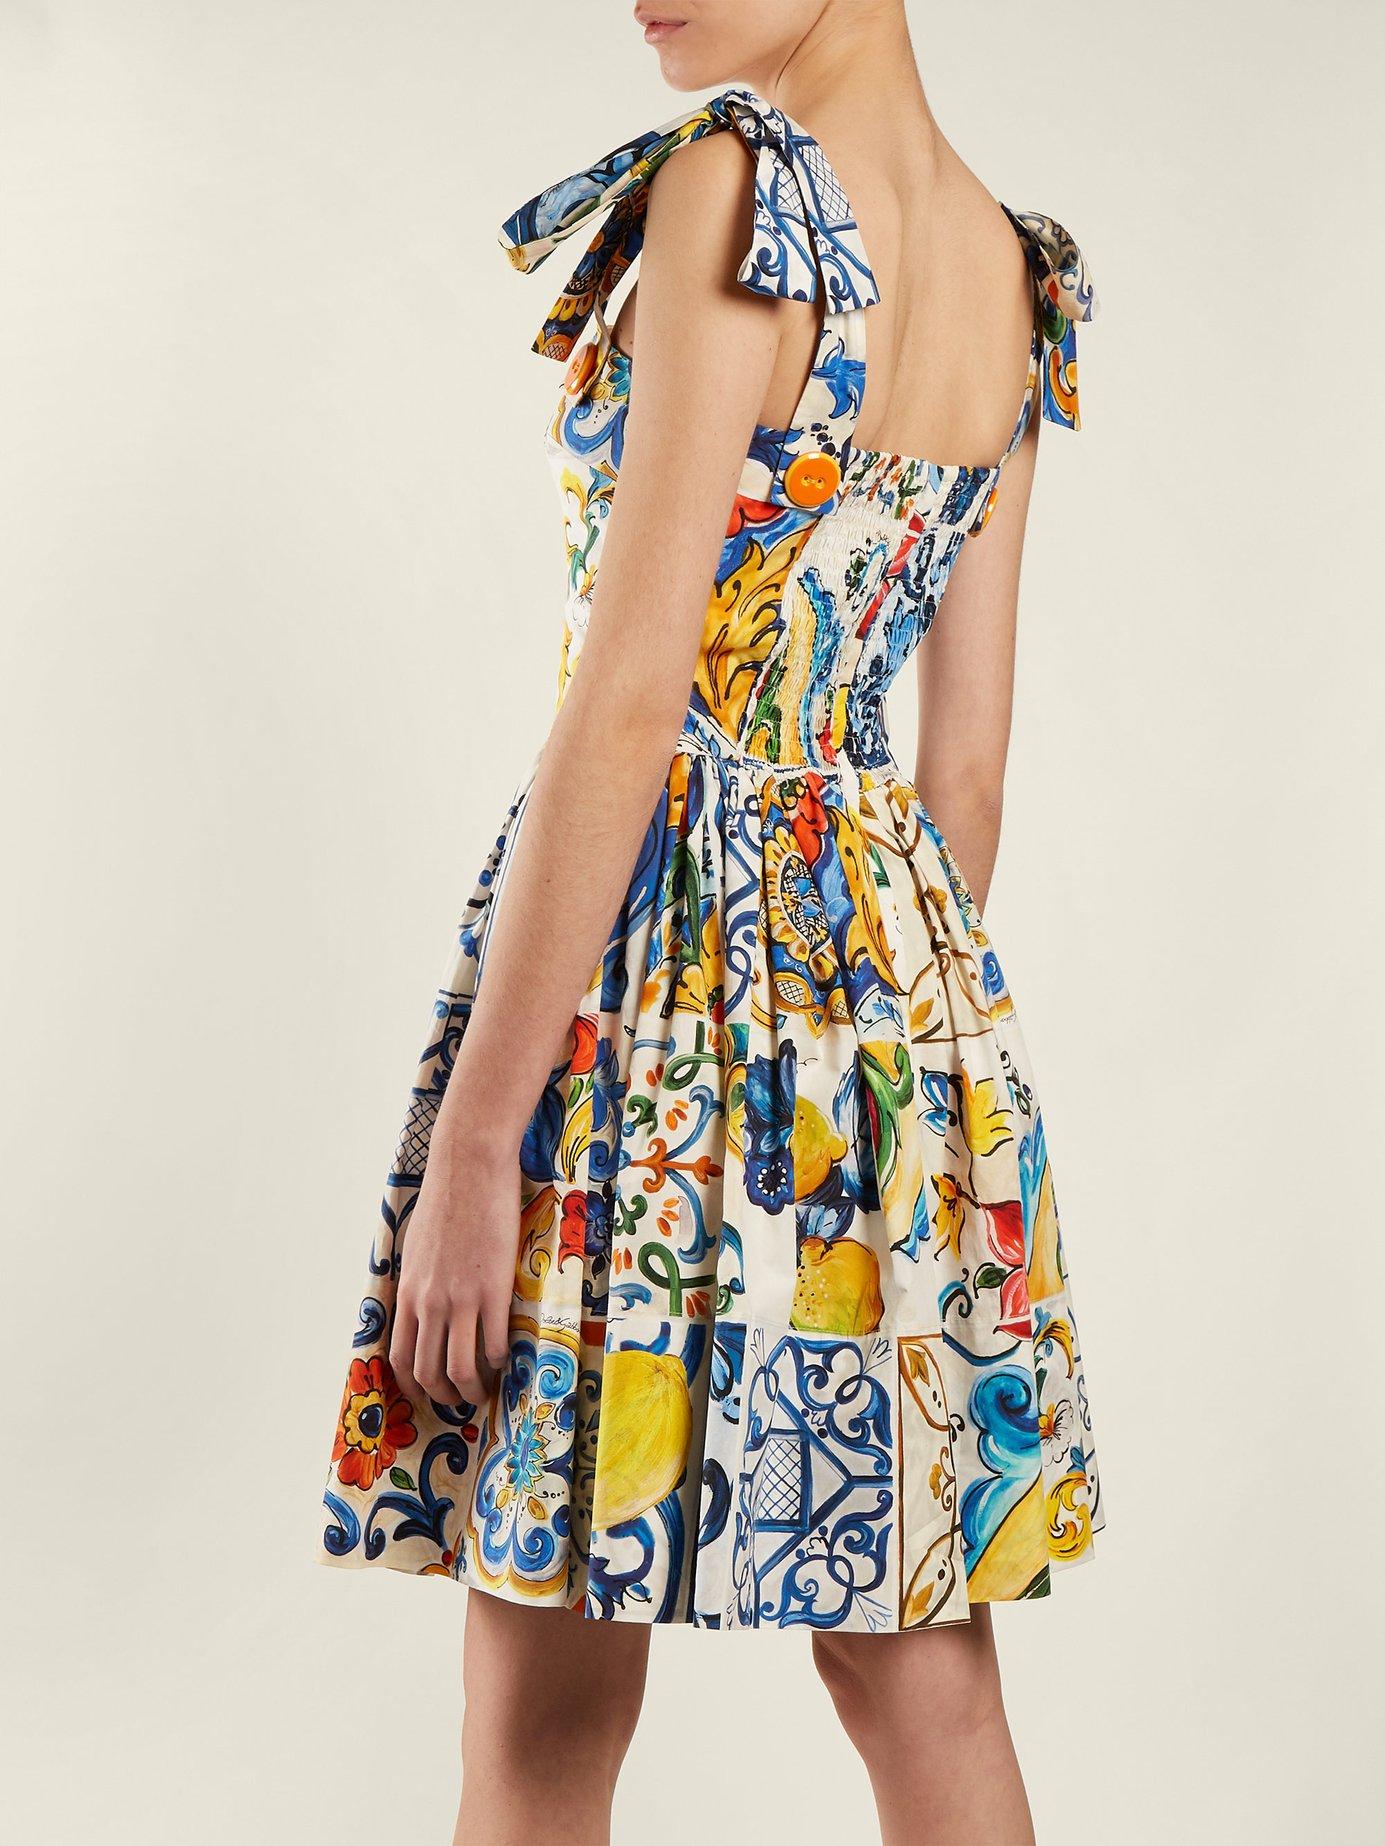 Majolica-print cotton-poplin mini dress by Dolce & Gabbana